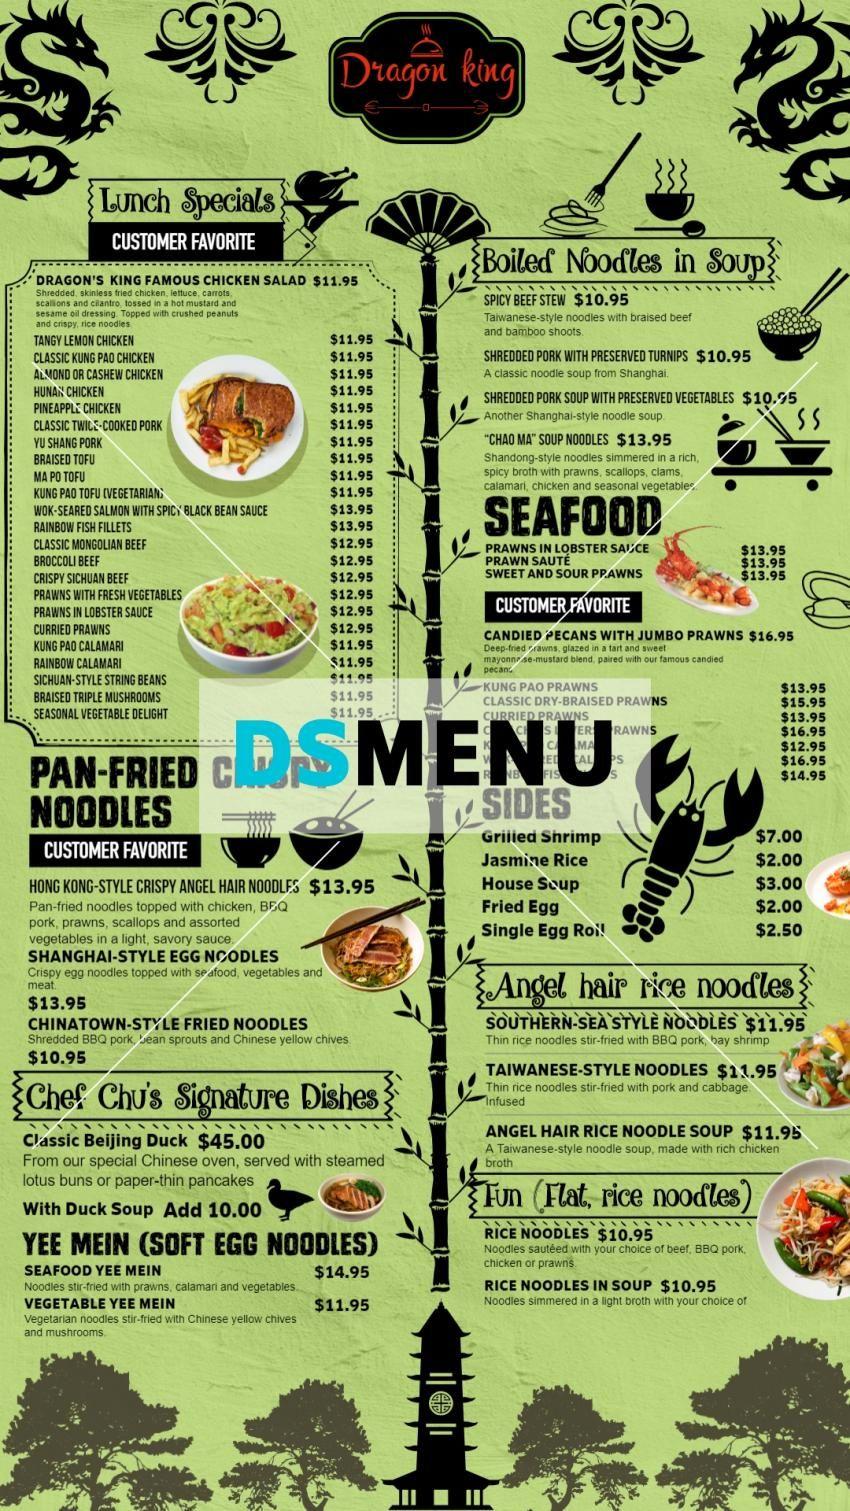 Lunch Special Digitalsignage Menu Board Design For Lunch Menu Lunch Specials Chinese Menu Menu Board Design